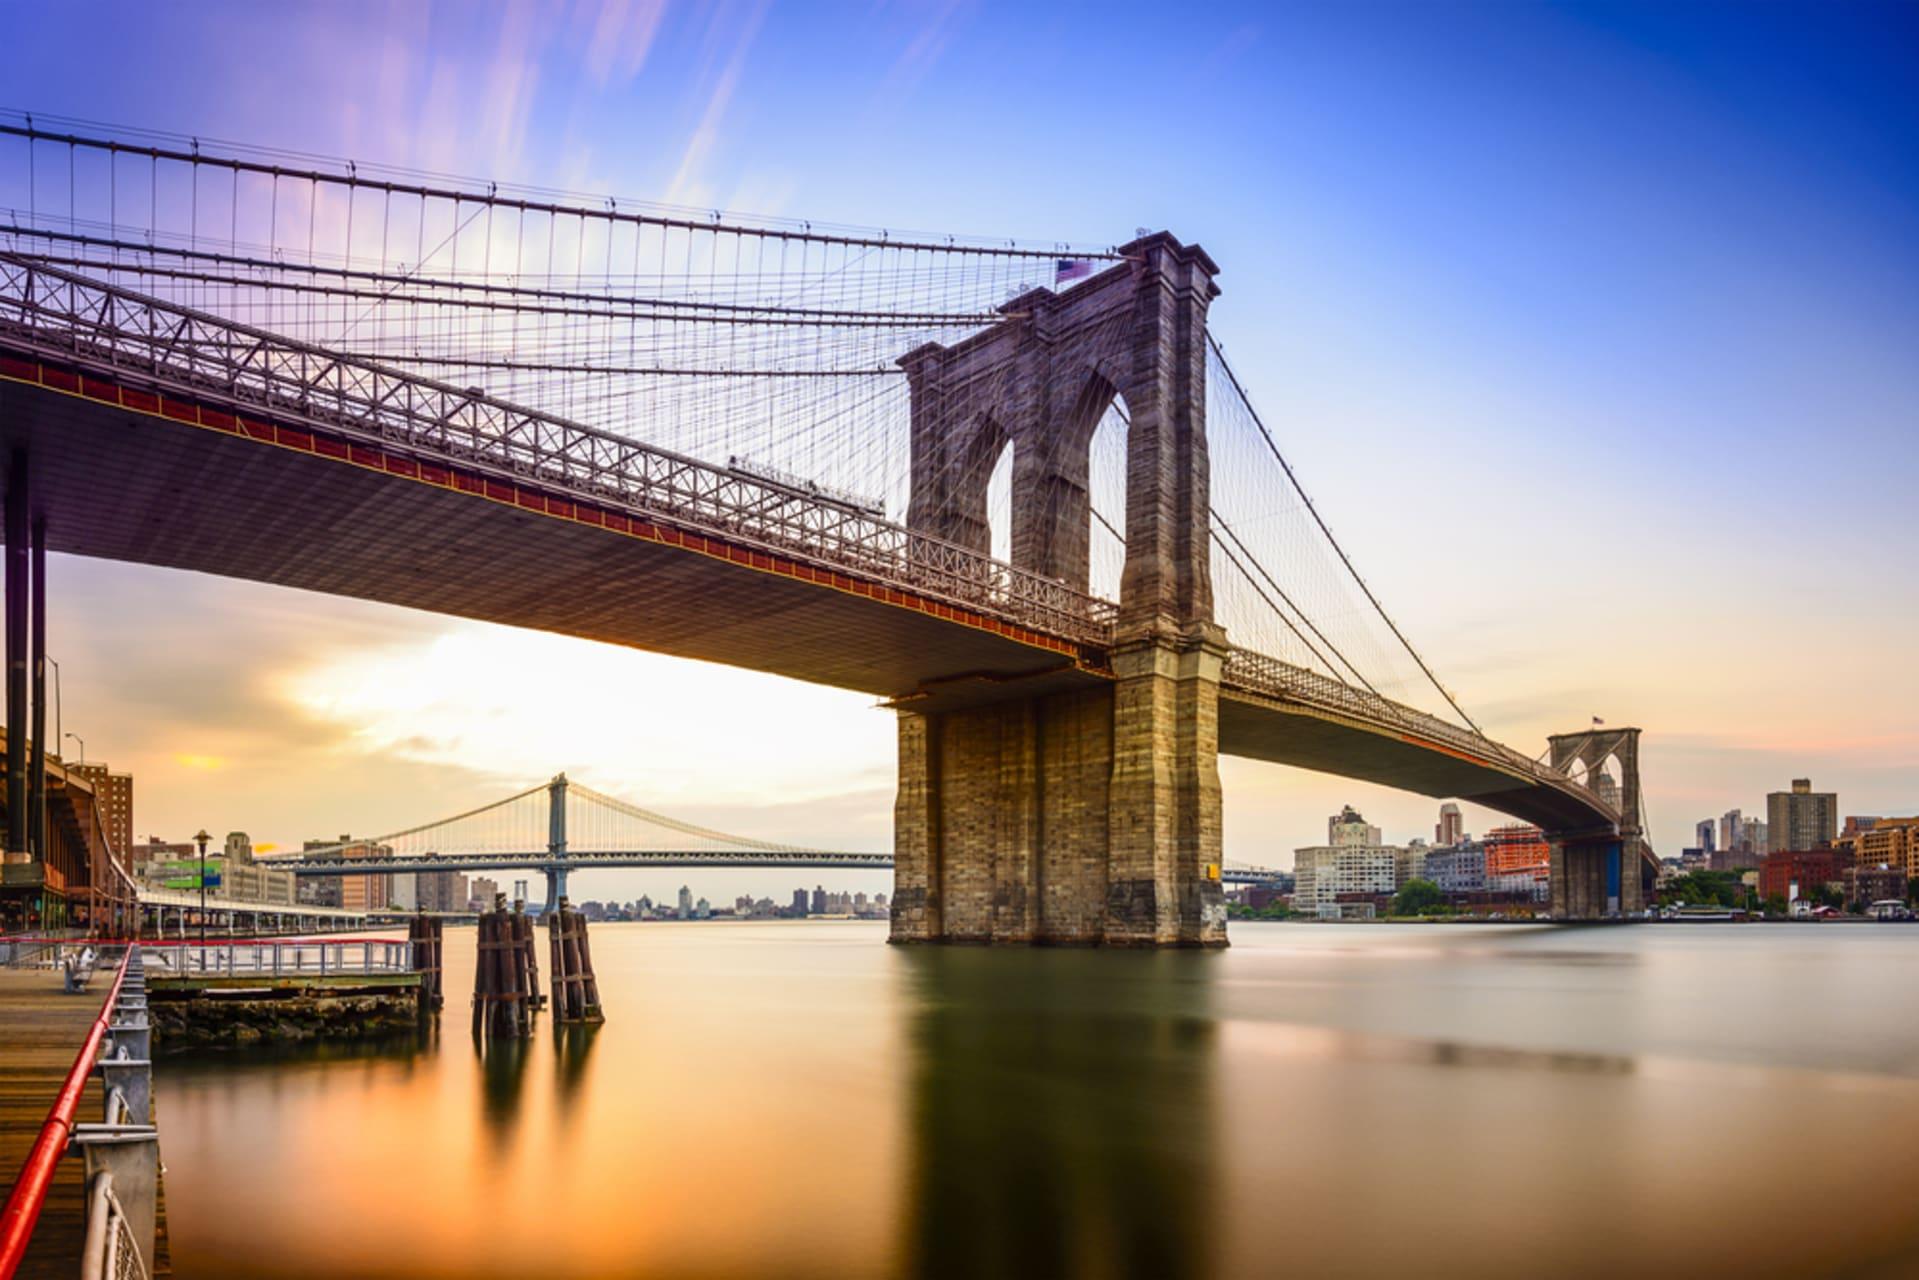 New York - Walk Across the Brooklyn Bridge